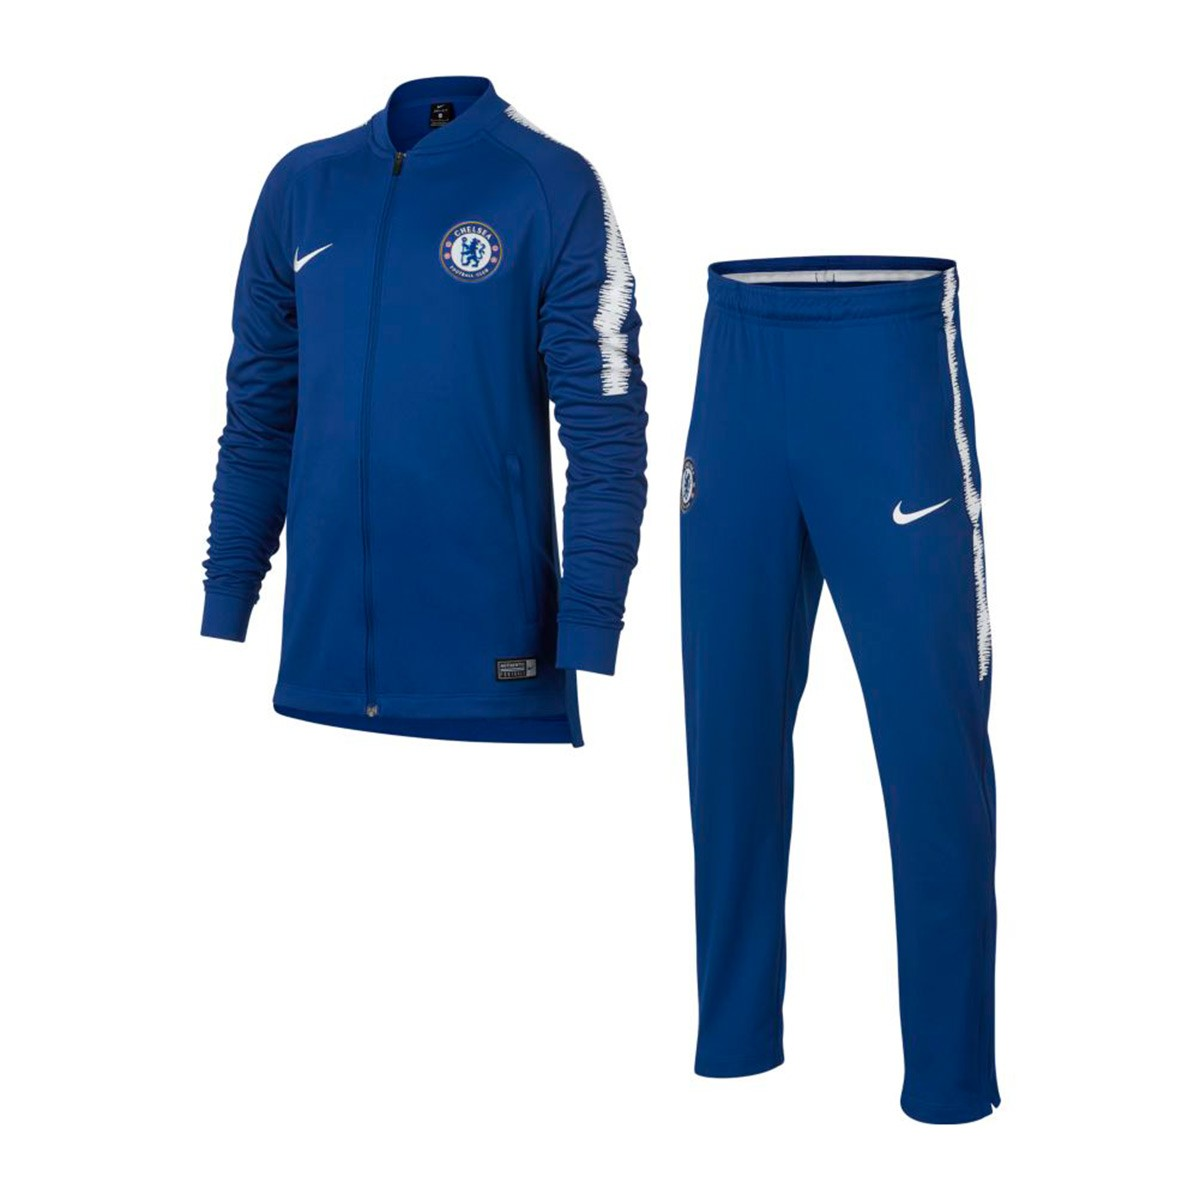 55dc99e8488da Tracksuit Nike Kids Dry Chelsea FC Squad 2018-2019 Rush blue-White ...